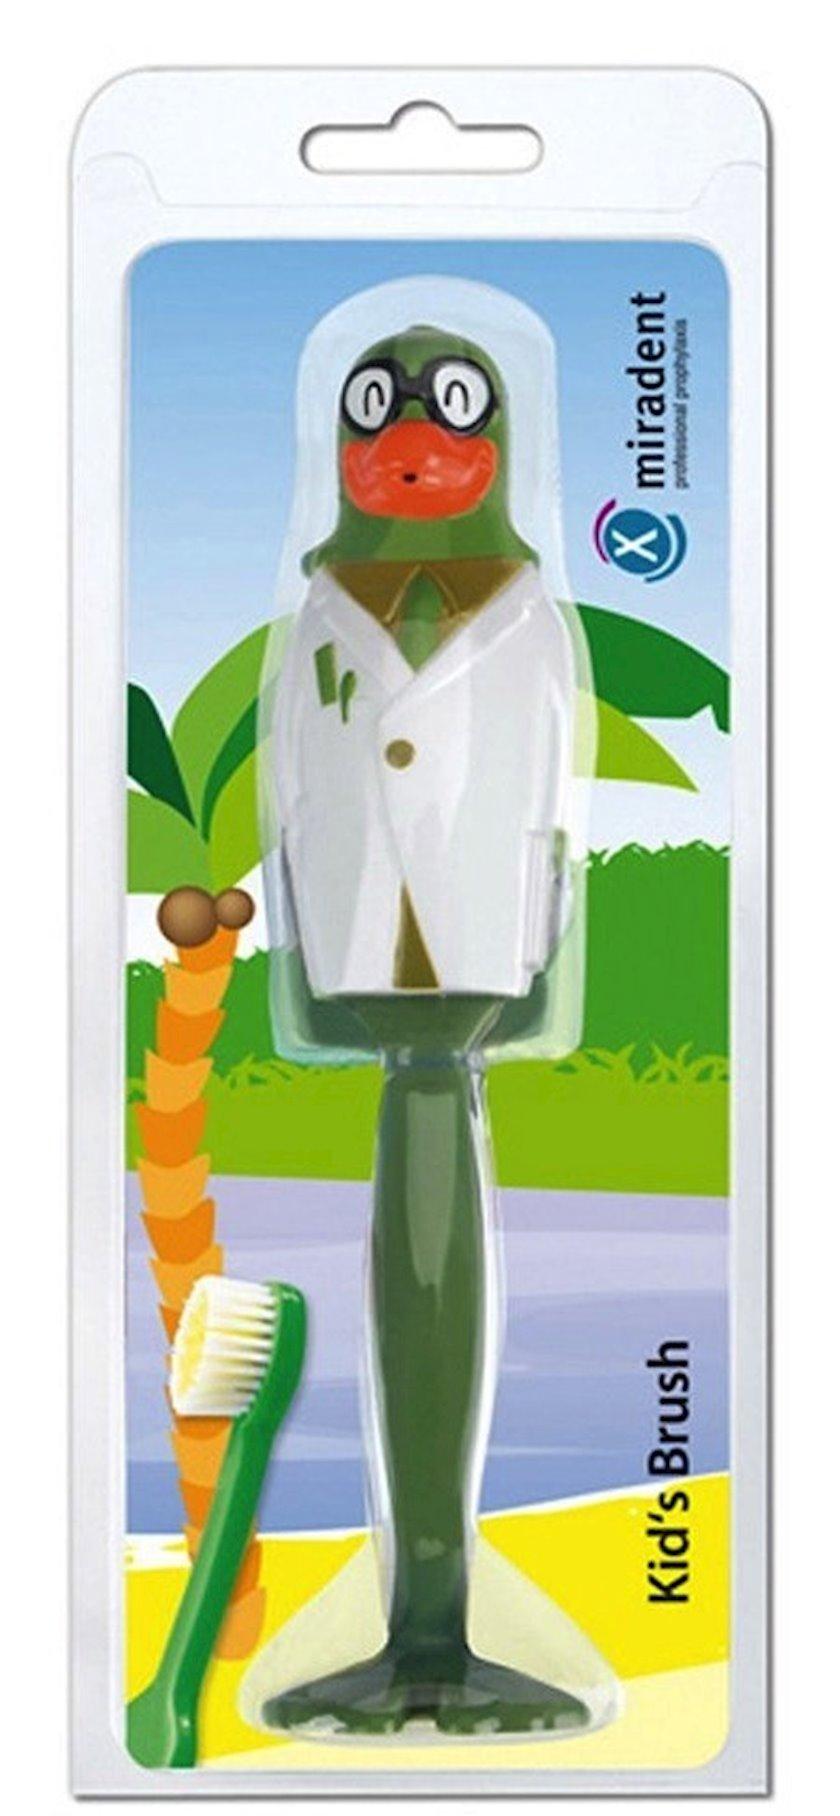 Diş fırçası uşaq üçün Miradent Kids Brush Parrot Soft